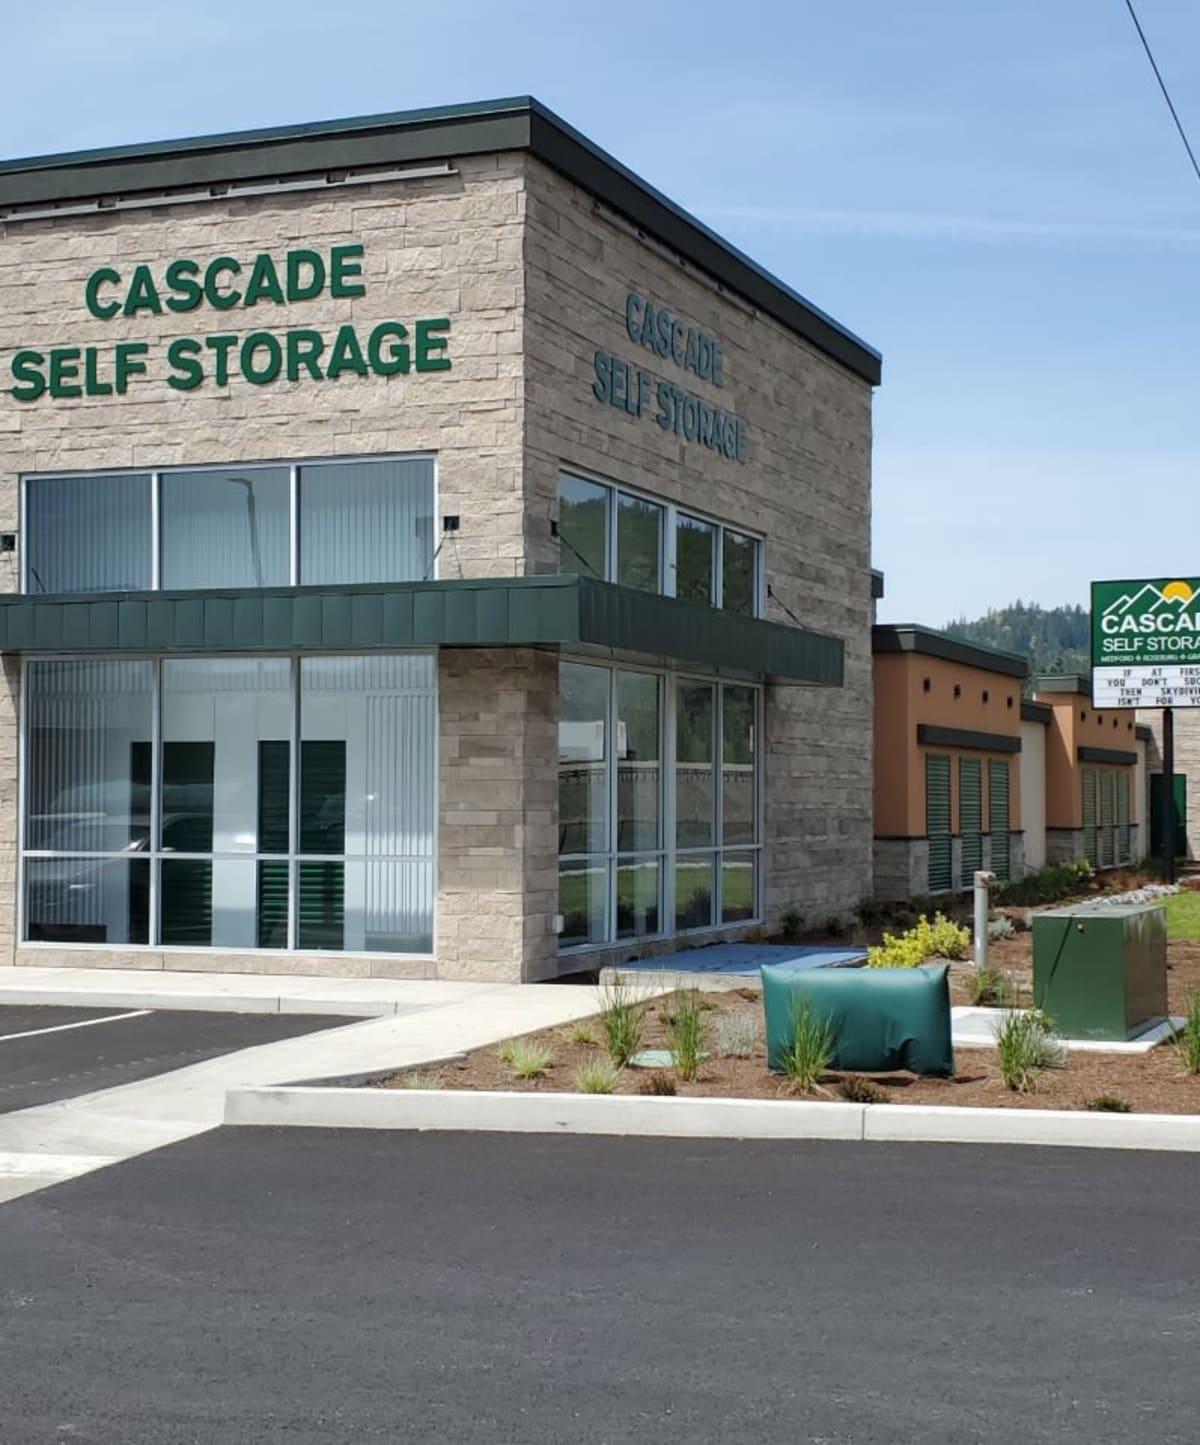 Cascade Self Storage in Grants Pass, Oregon